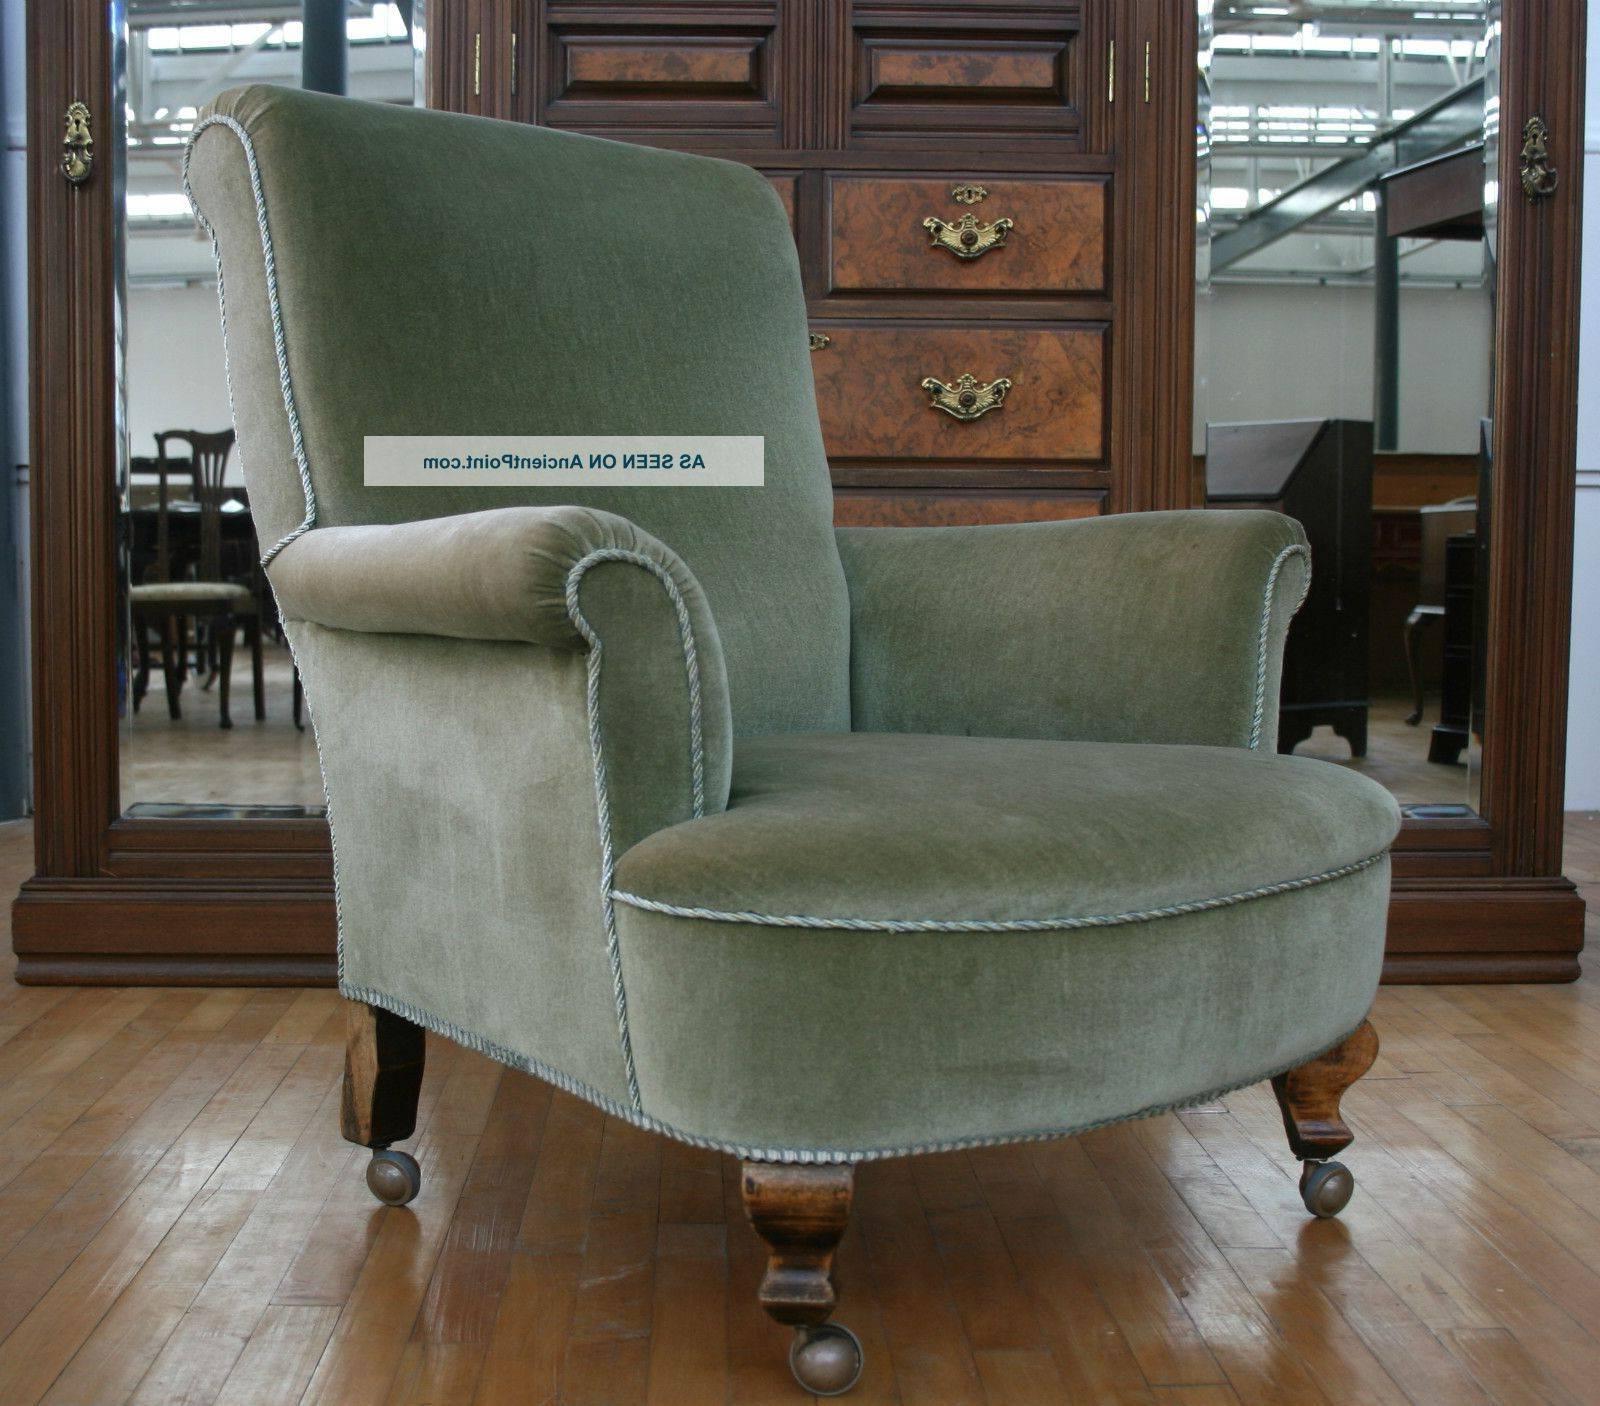 Full Size of Wohnzimmer Sessel Design Luxus Aenkrwd Wohnzimmer Wohnzimmer Sessel